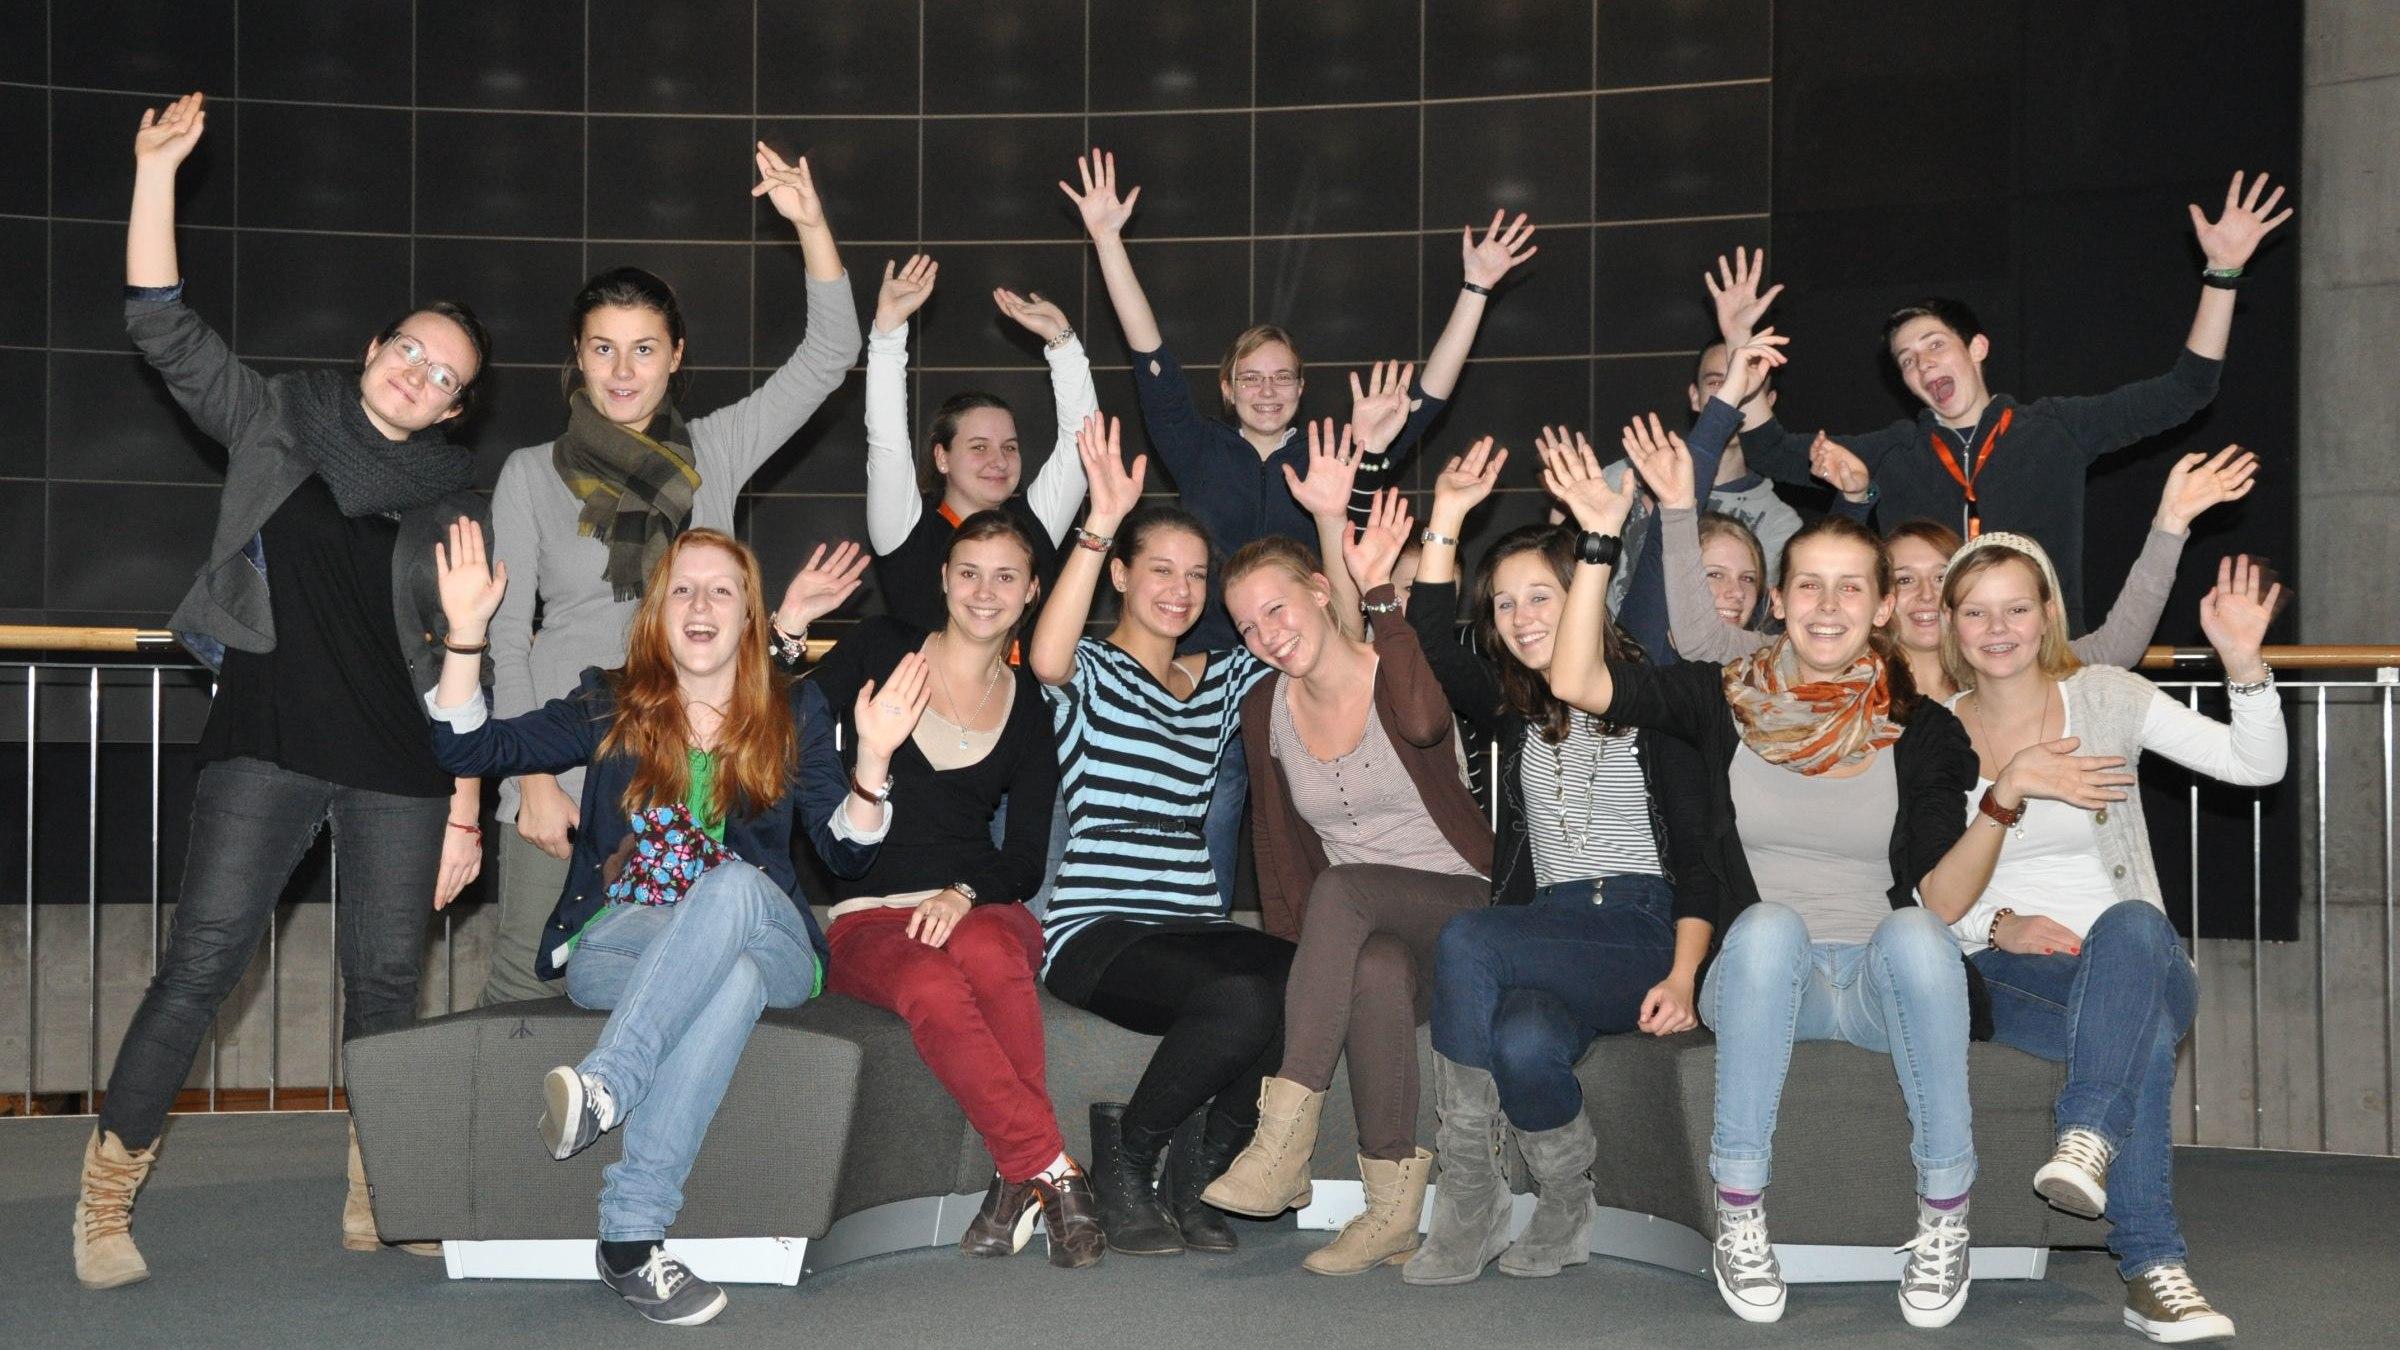 Gruppenfoto der TeenGroup 2011/2012